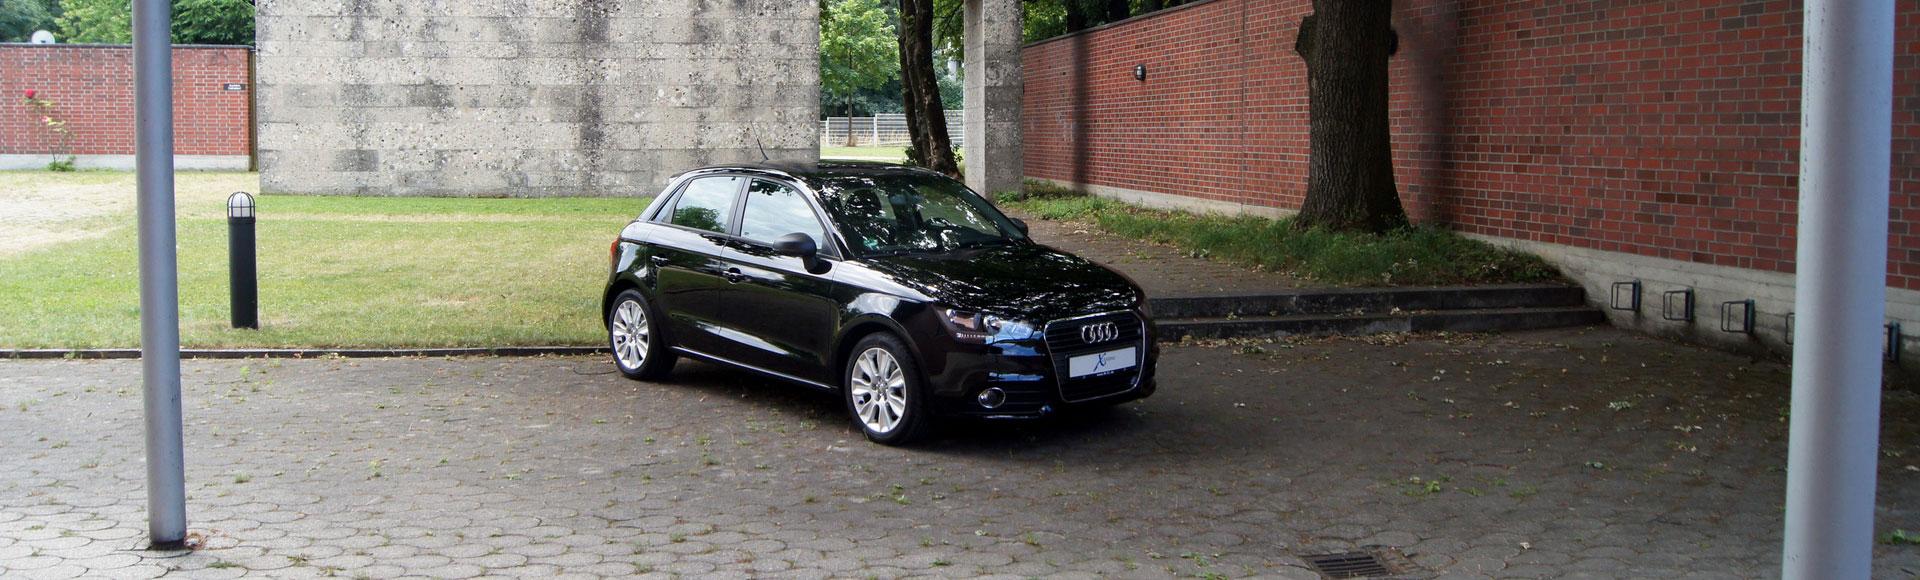 Audi A1 2013 Sommer 7930